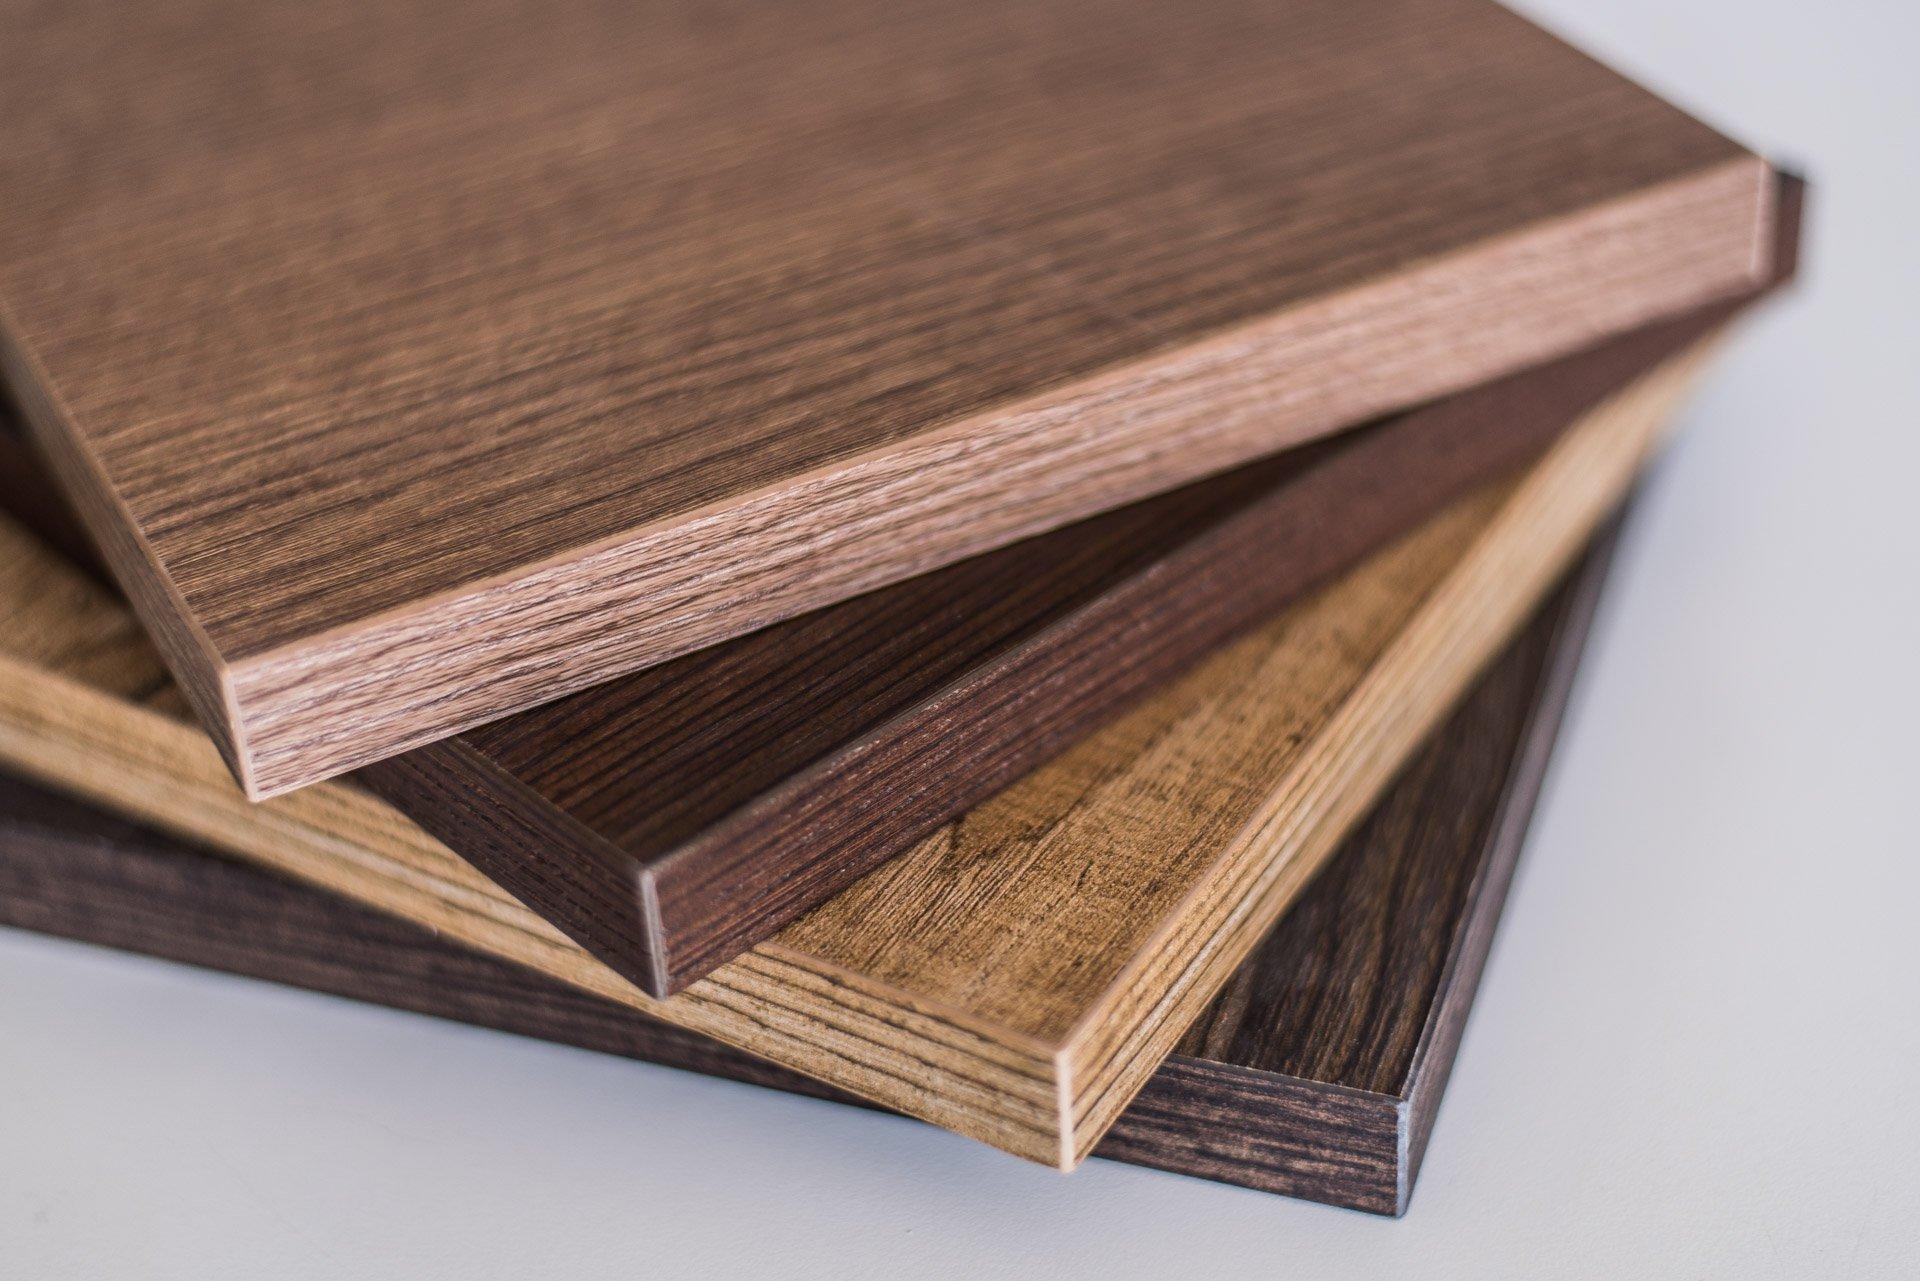 Ante melaminico effetto legno ante cucina - Ante cucina legno ...